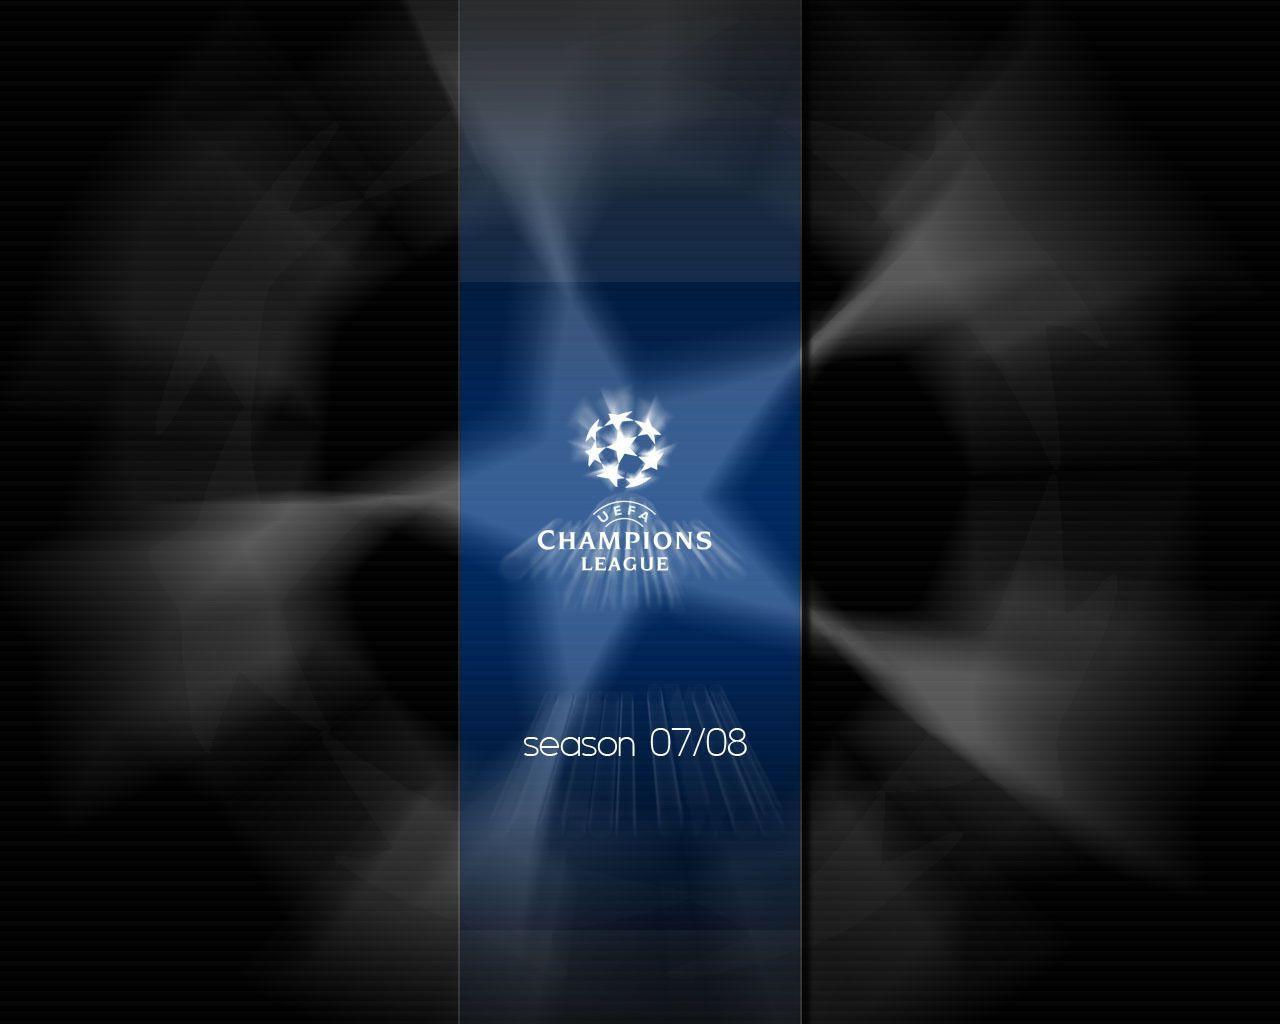 UEFA - UEFA Champions League Wallpaper (2433648) - Fanpop